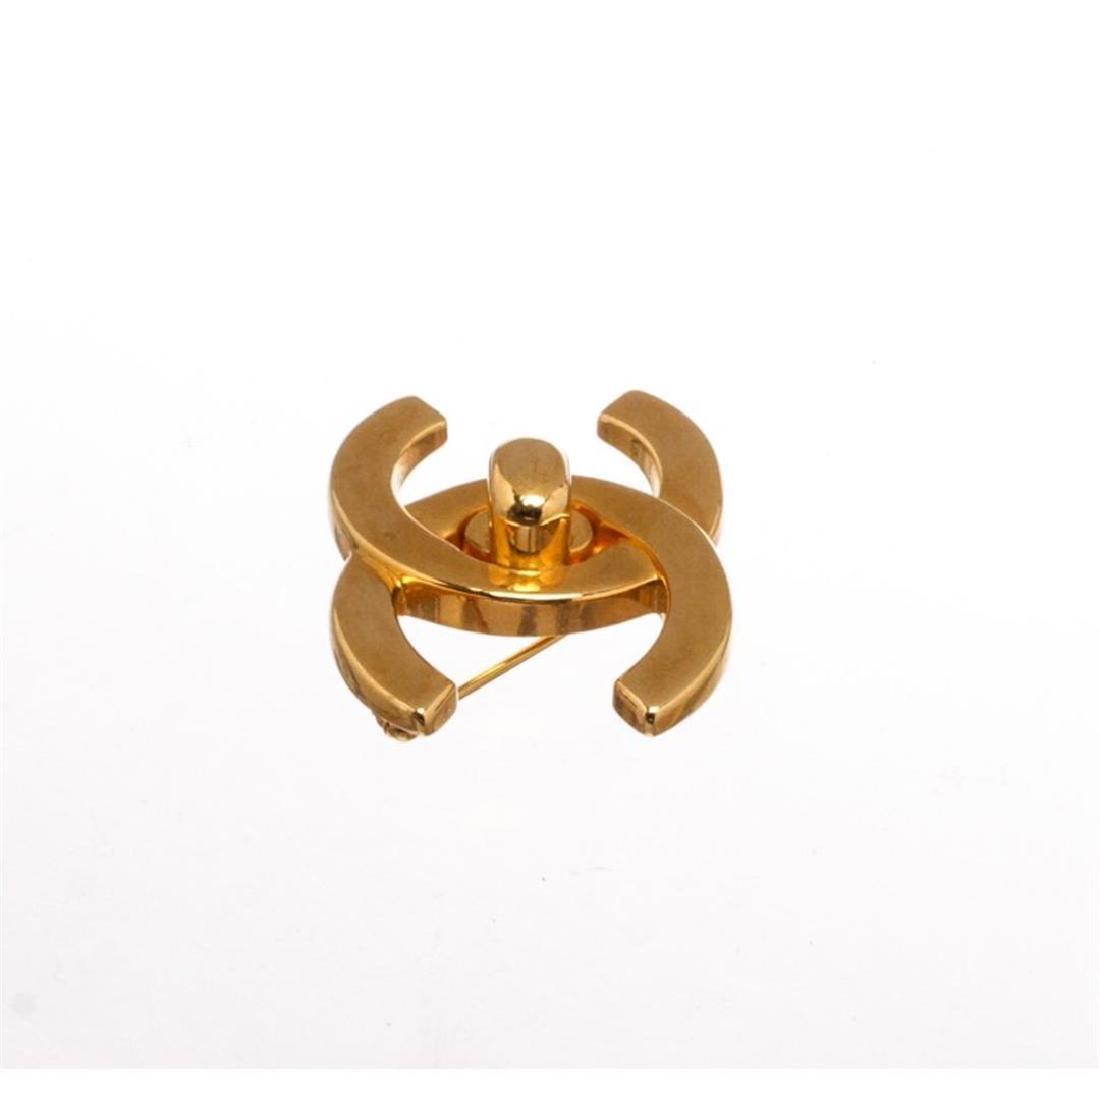 Chanel Gold Turn Lock CC Logo Brooch 96P